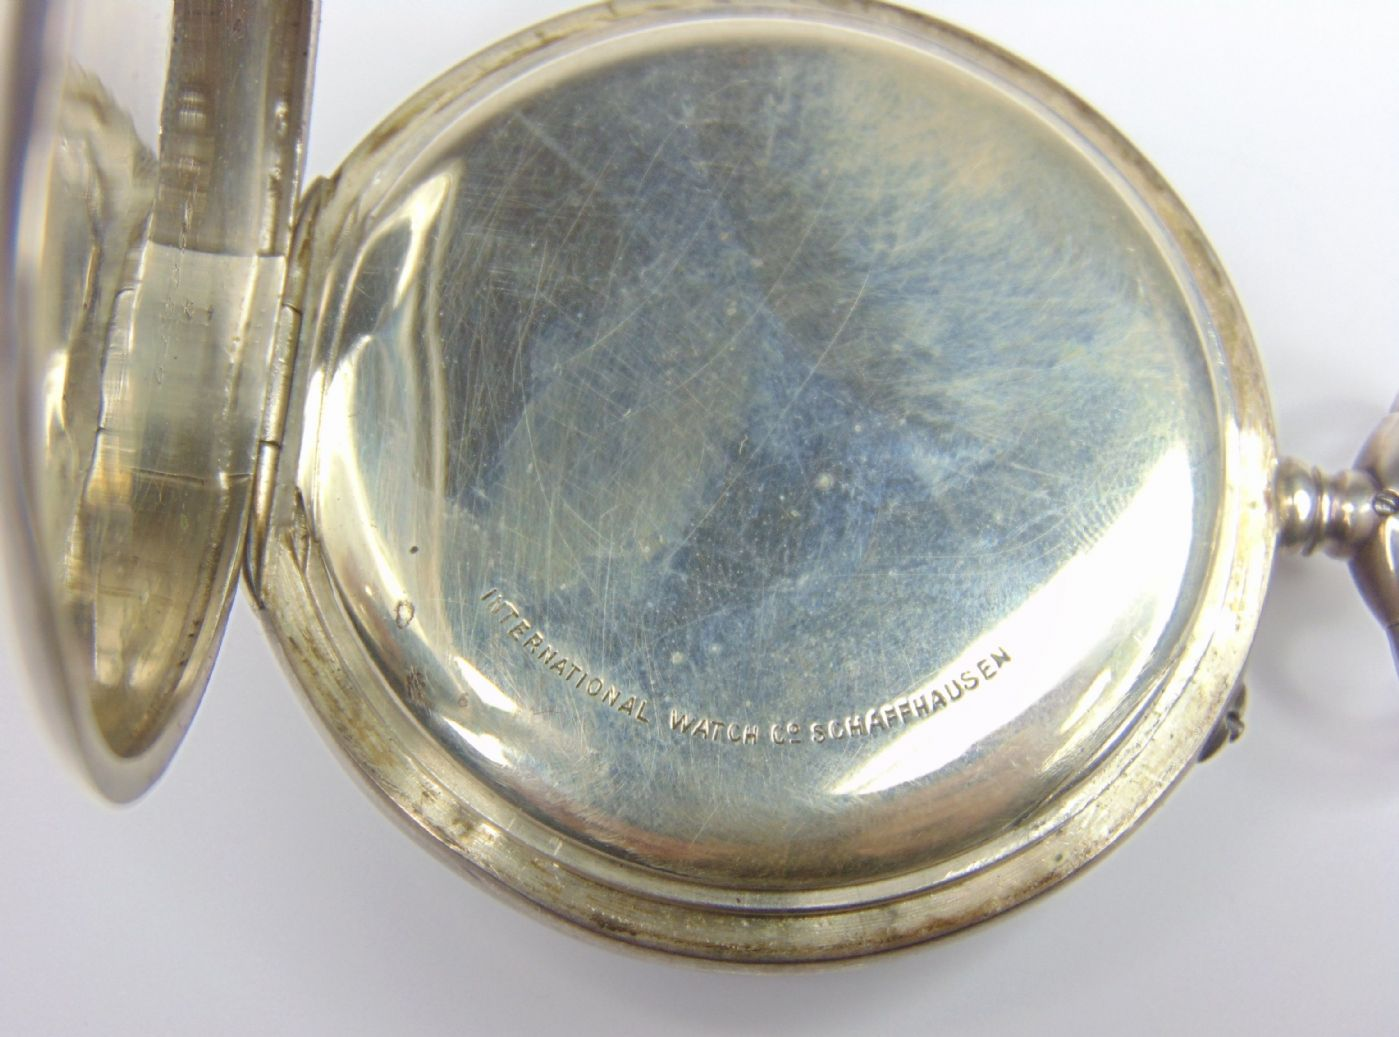 thumb4|Orologio da tasca in argento International Watch Co. fine '800